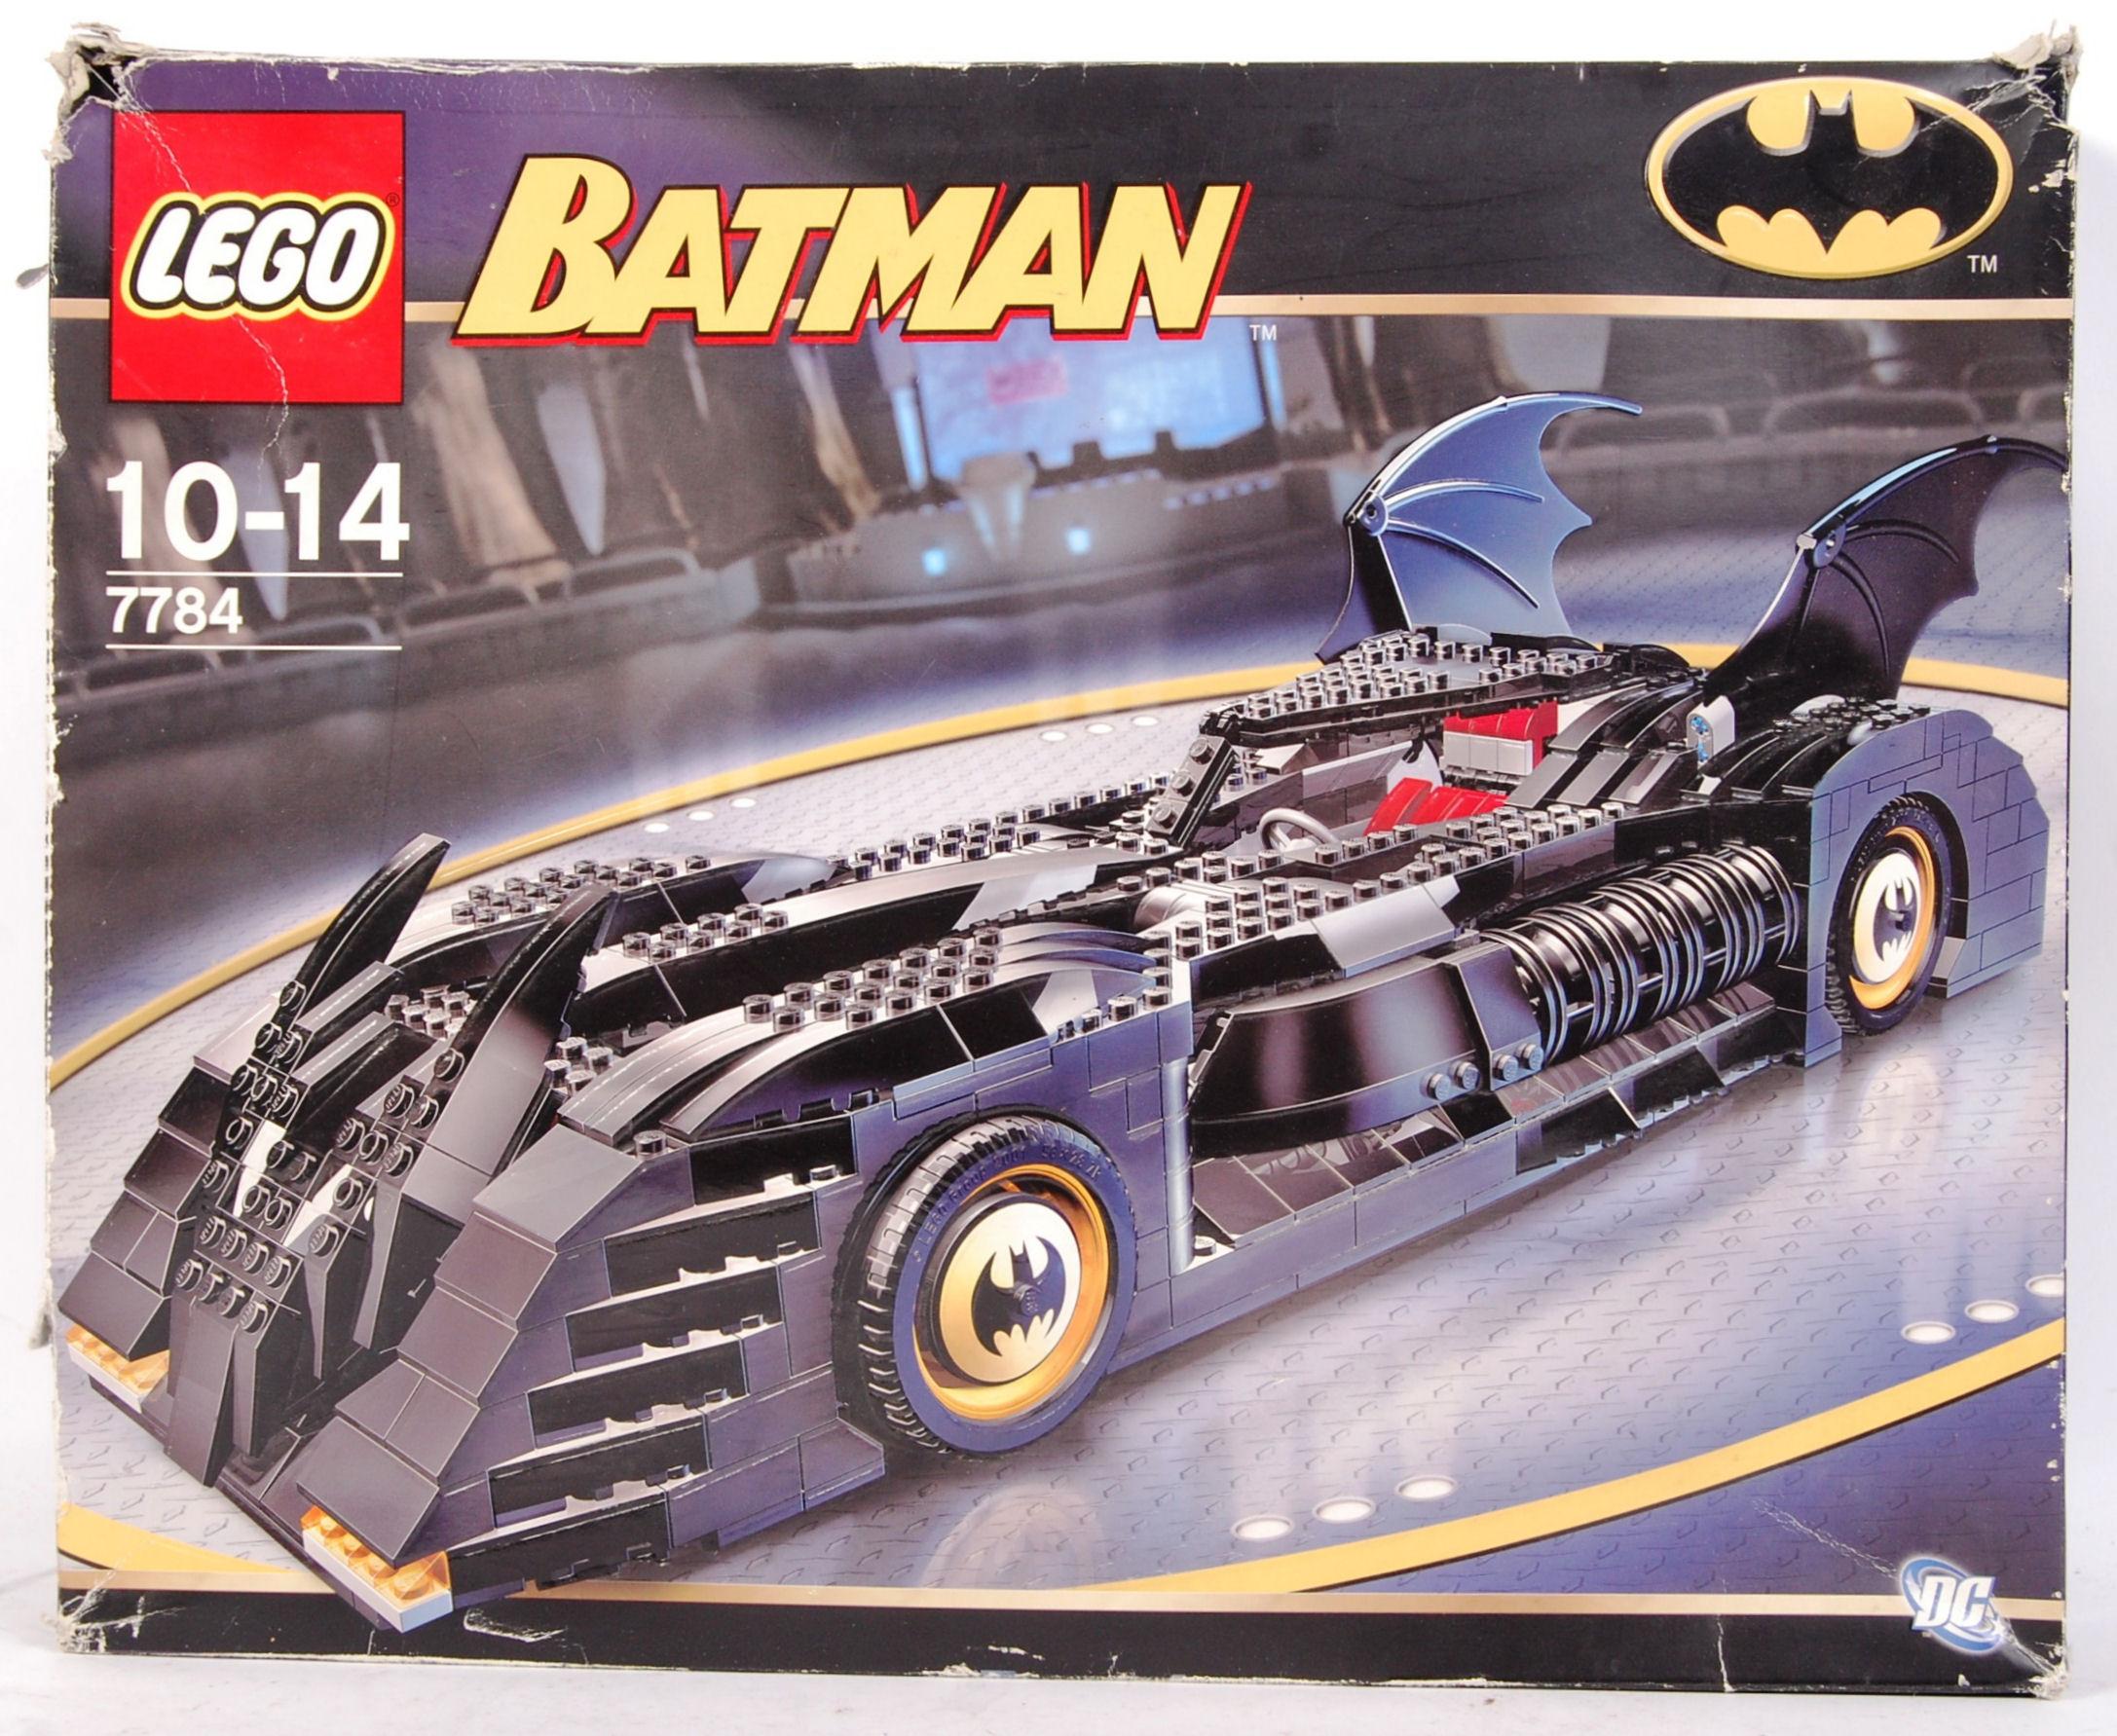 An Original First Issue Lego Batman Batmobile Set 7784 All